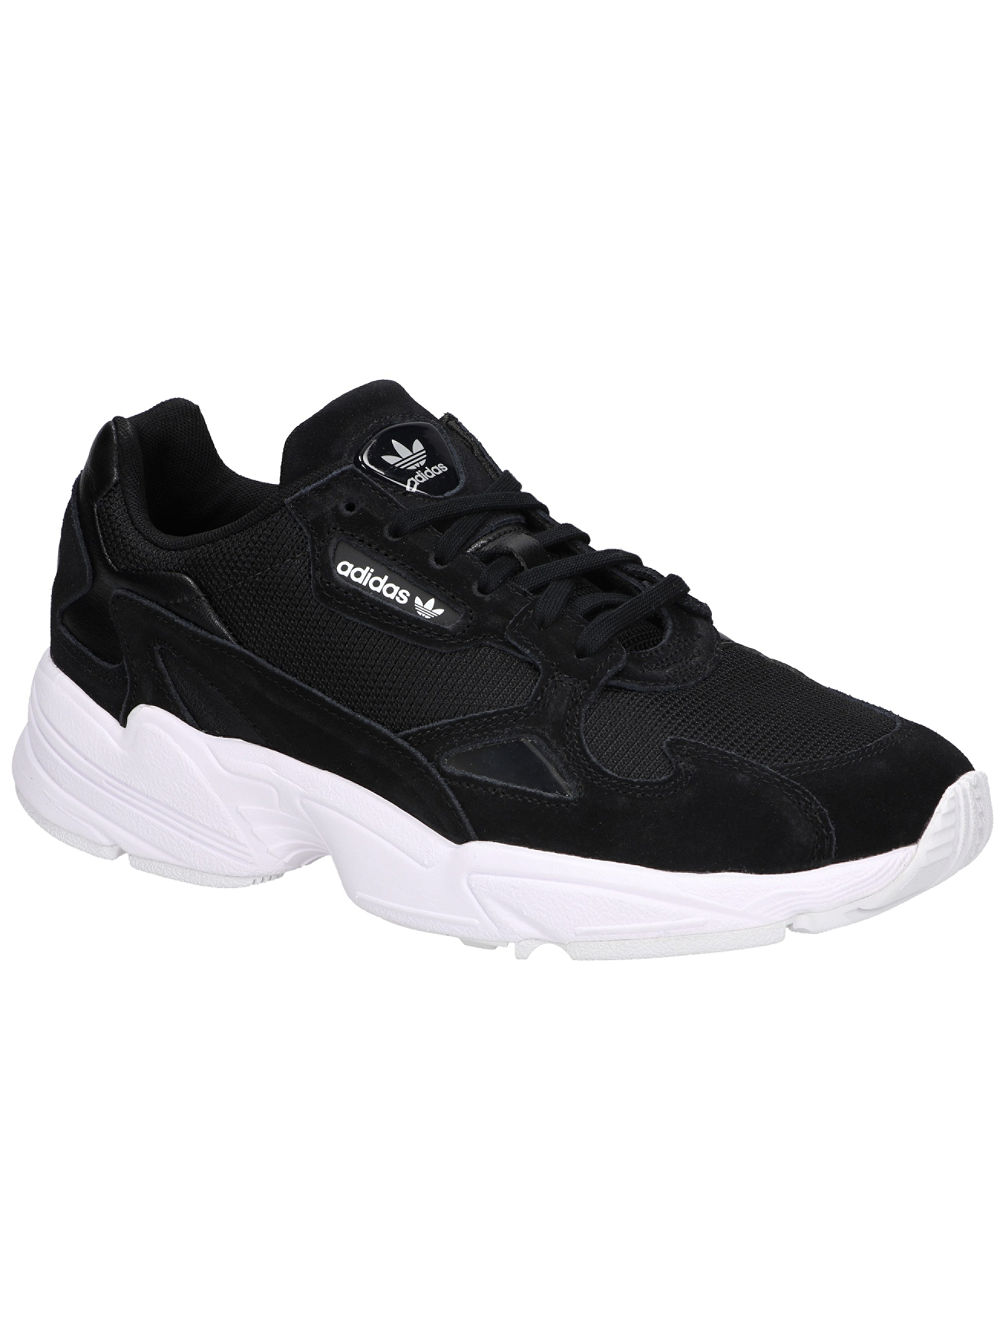 online store 6057b b929b adidas Originals Falcon Sneakers